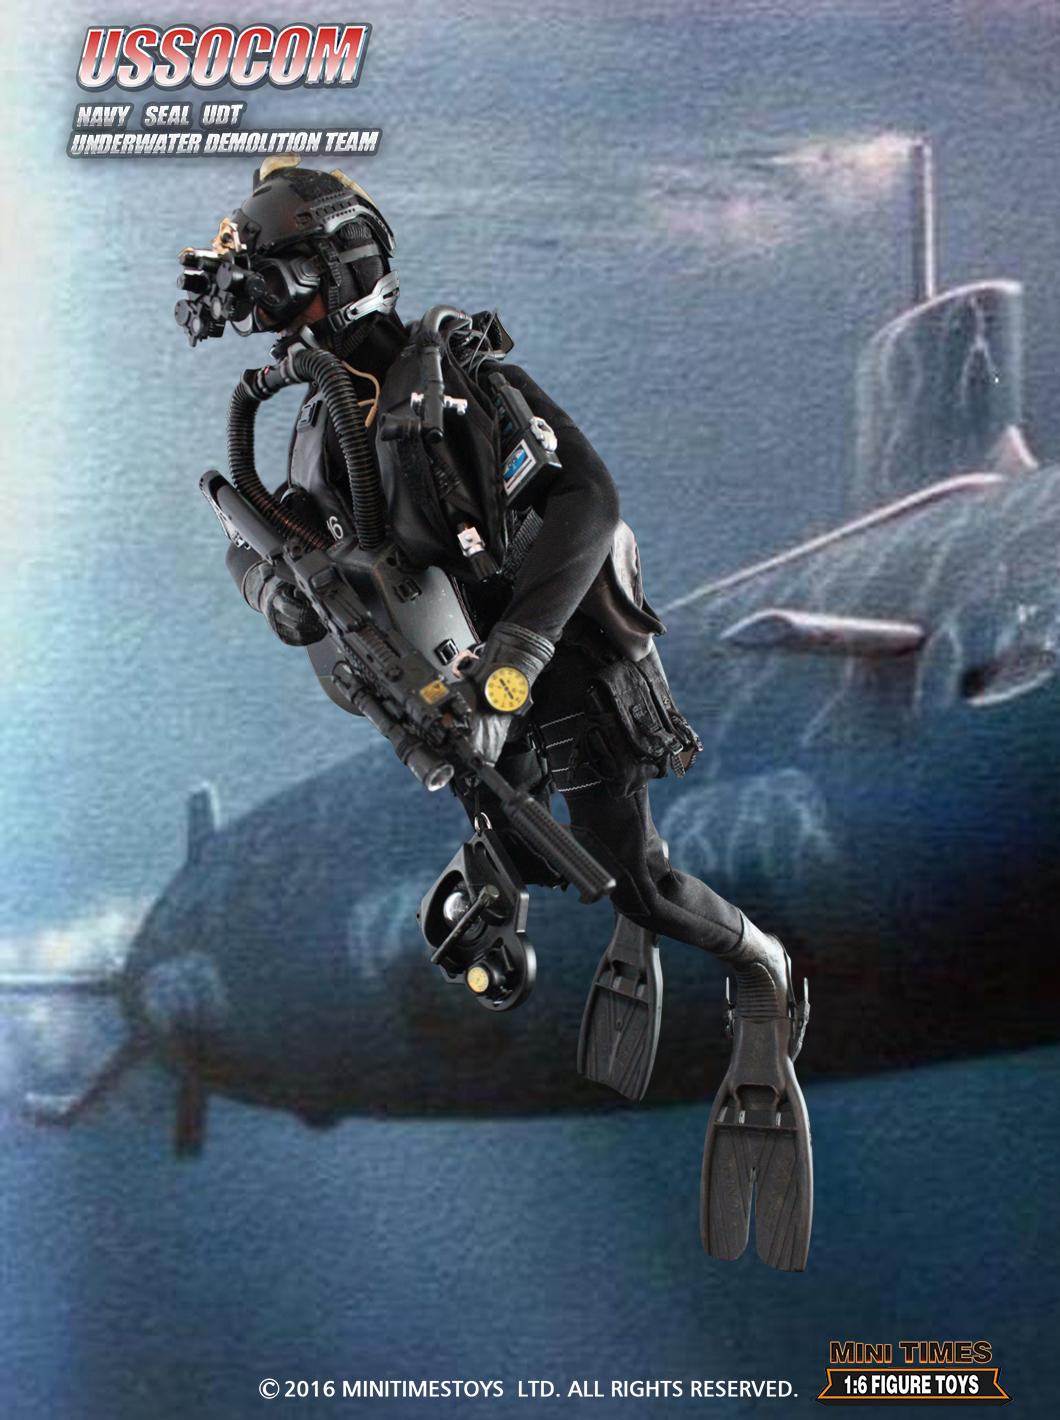 Mini Times Toys M003 USSOCOM NAVY SEAL